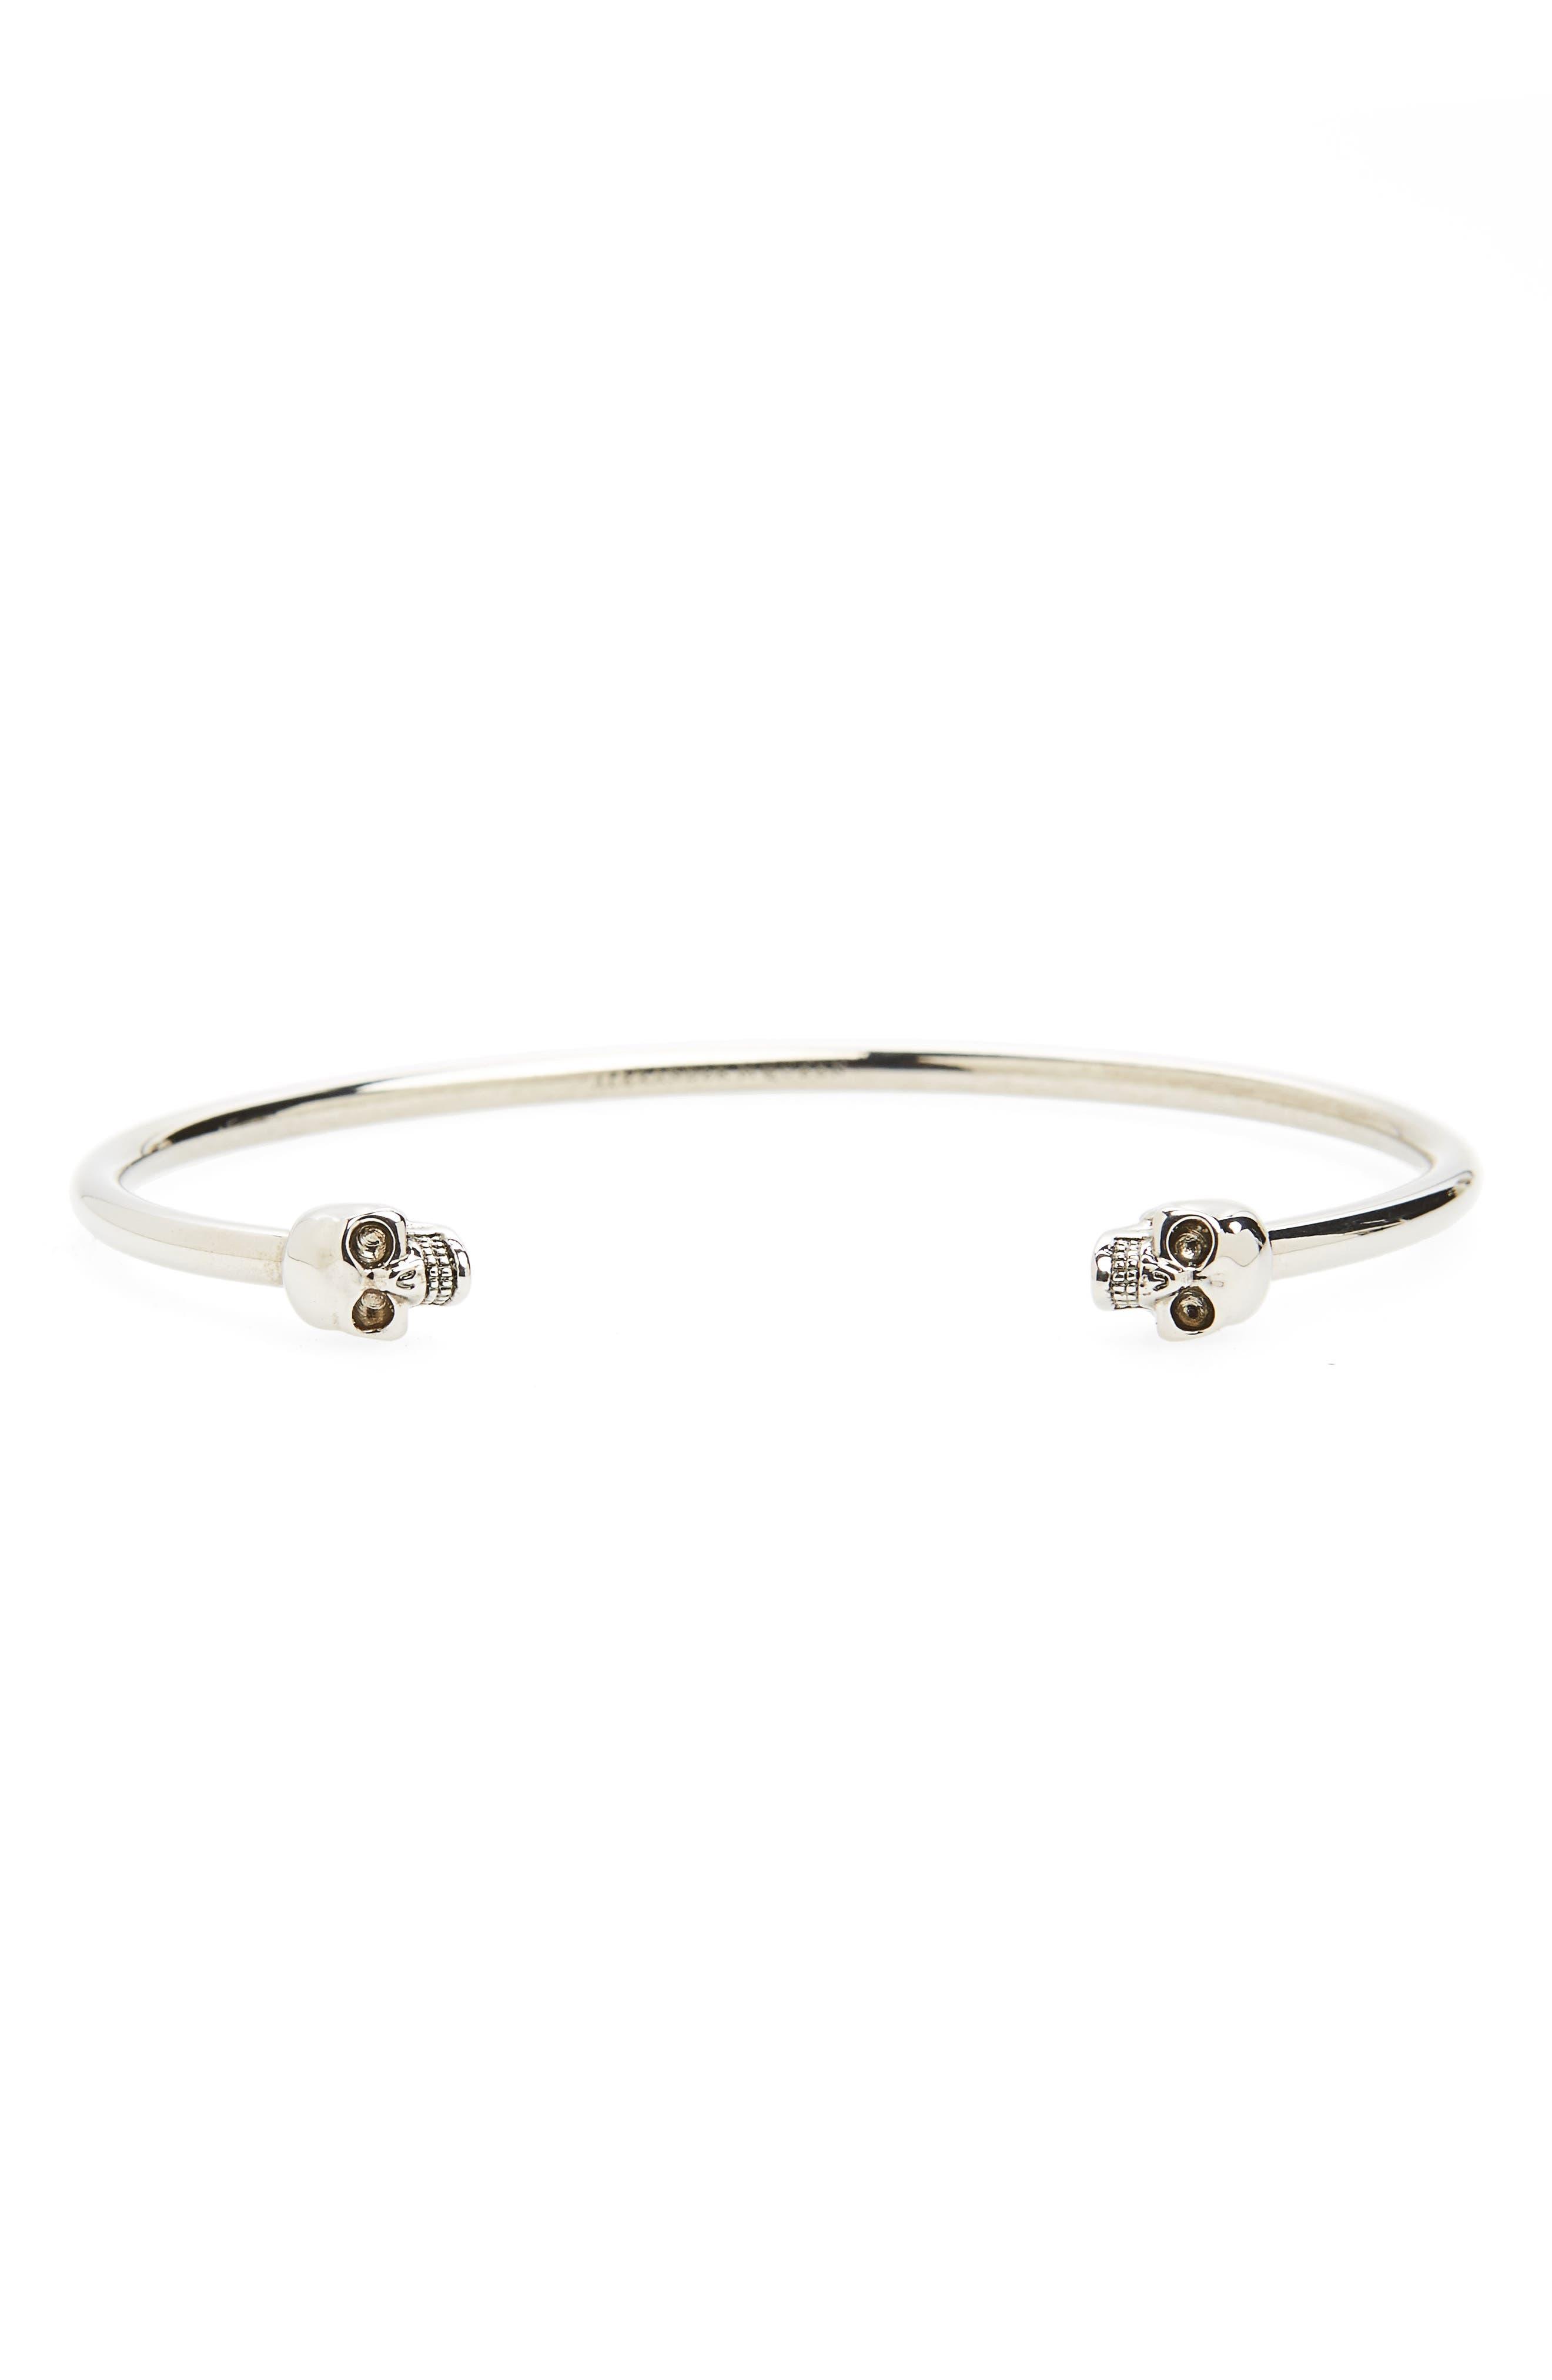 Twin Skull Cuff Bracelet,                         Main,                         color, Grey